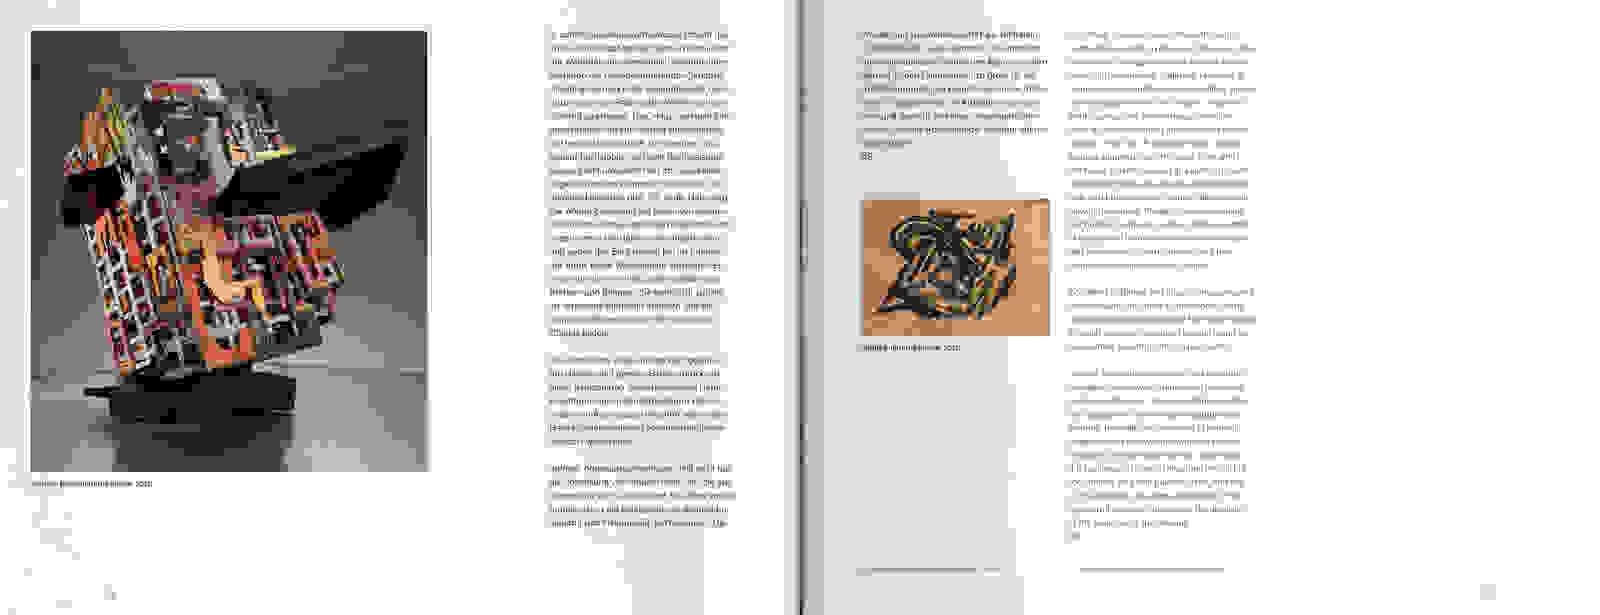 Phyllida Barlow DS 1600x615 11